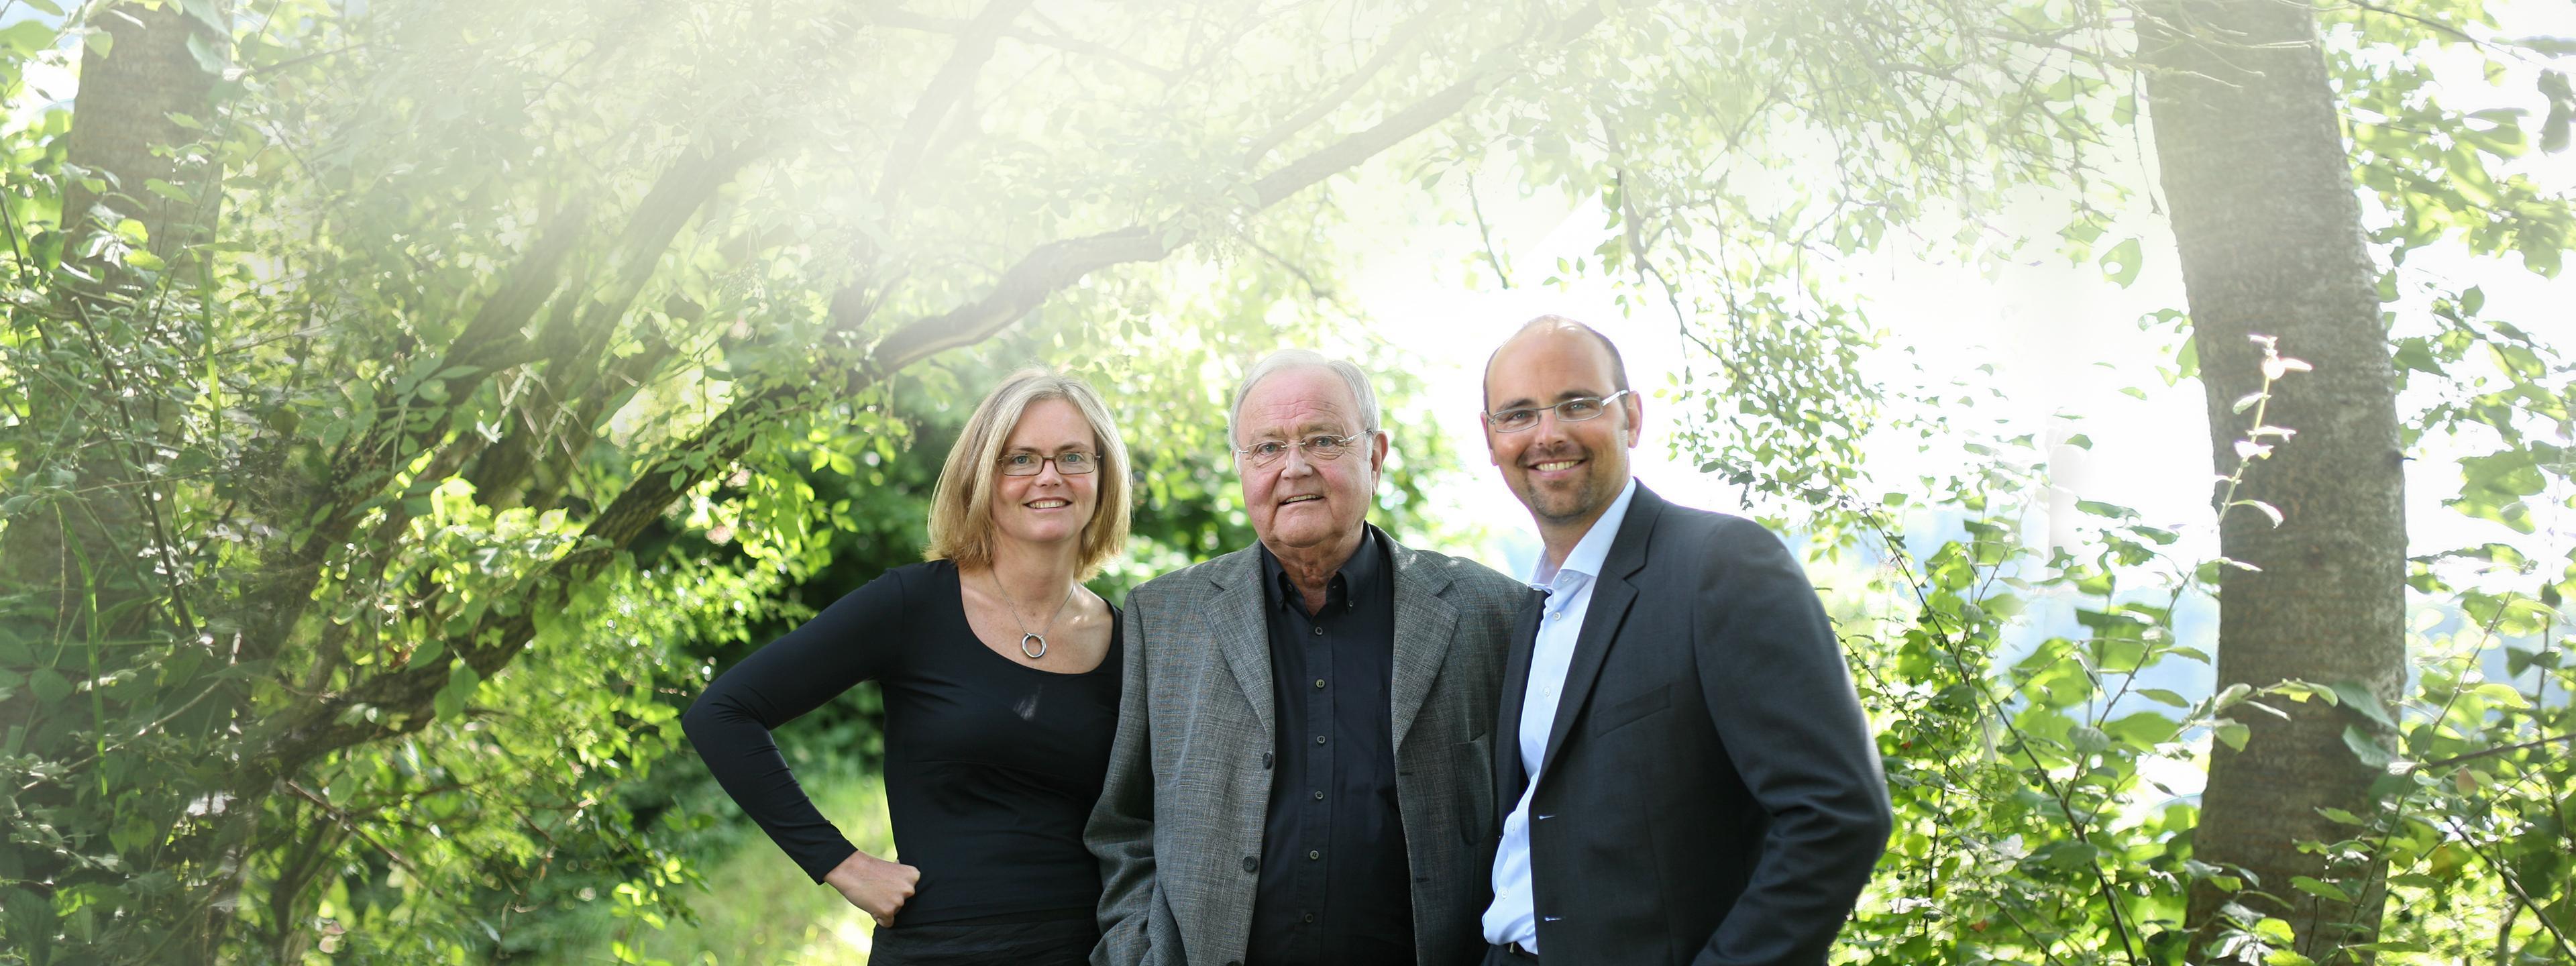 BRITA geschiedenis BRITA Heinz en Markus Hankammer